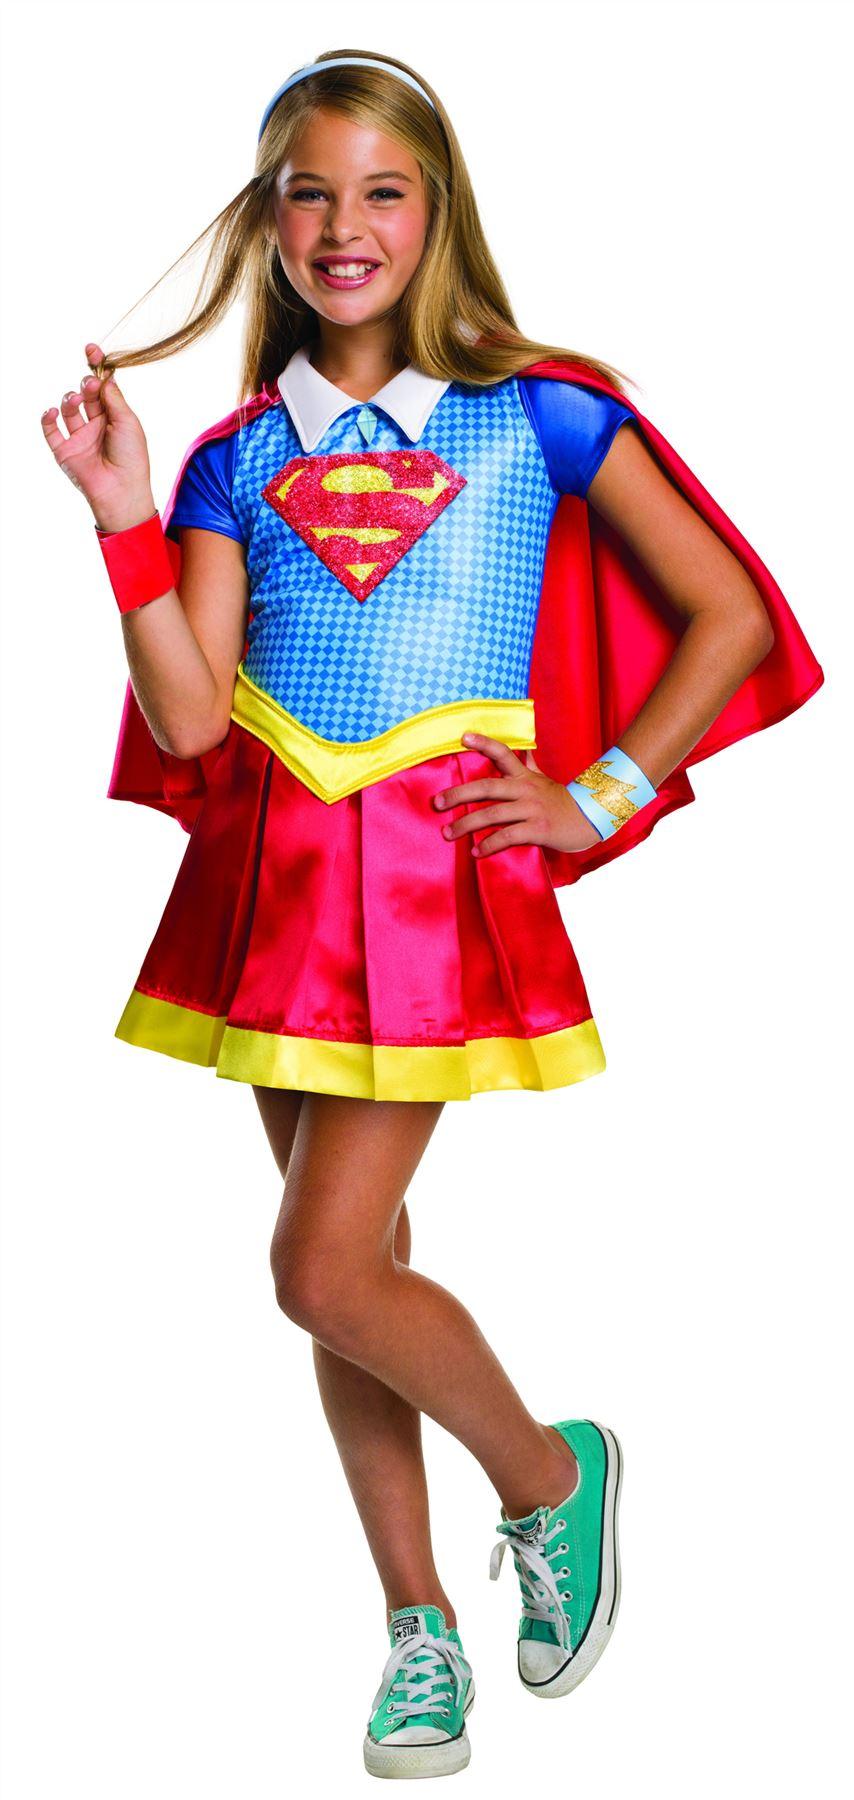 jeunes filles supergirl deluxe costume super hros dc comics dguisement - Super Heros Fille